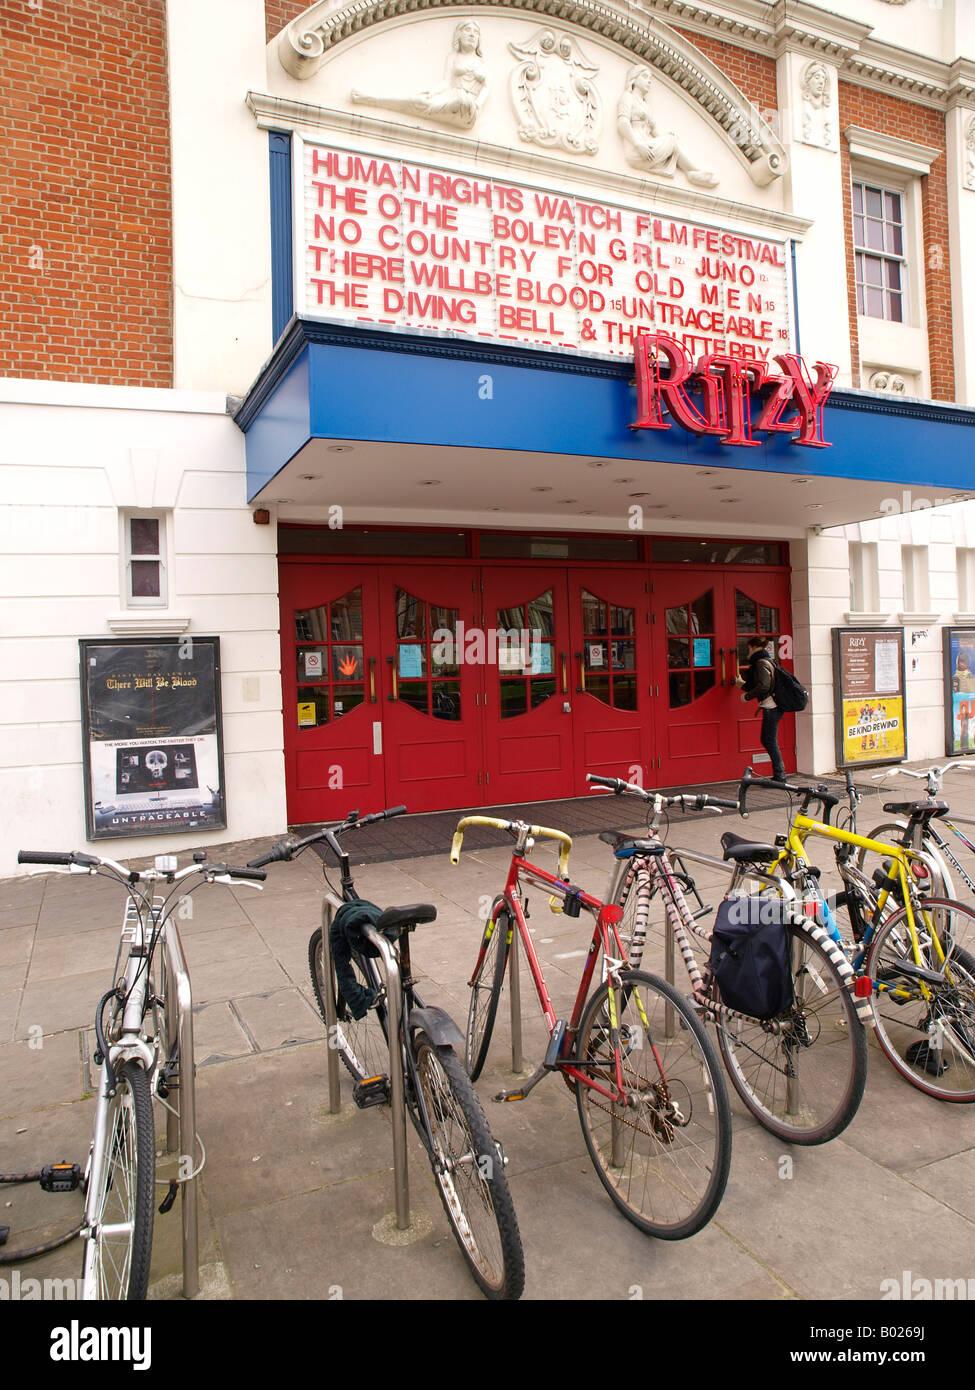 Bicycles at Ritzy Cinema Brixton London - Stock Image